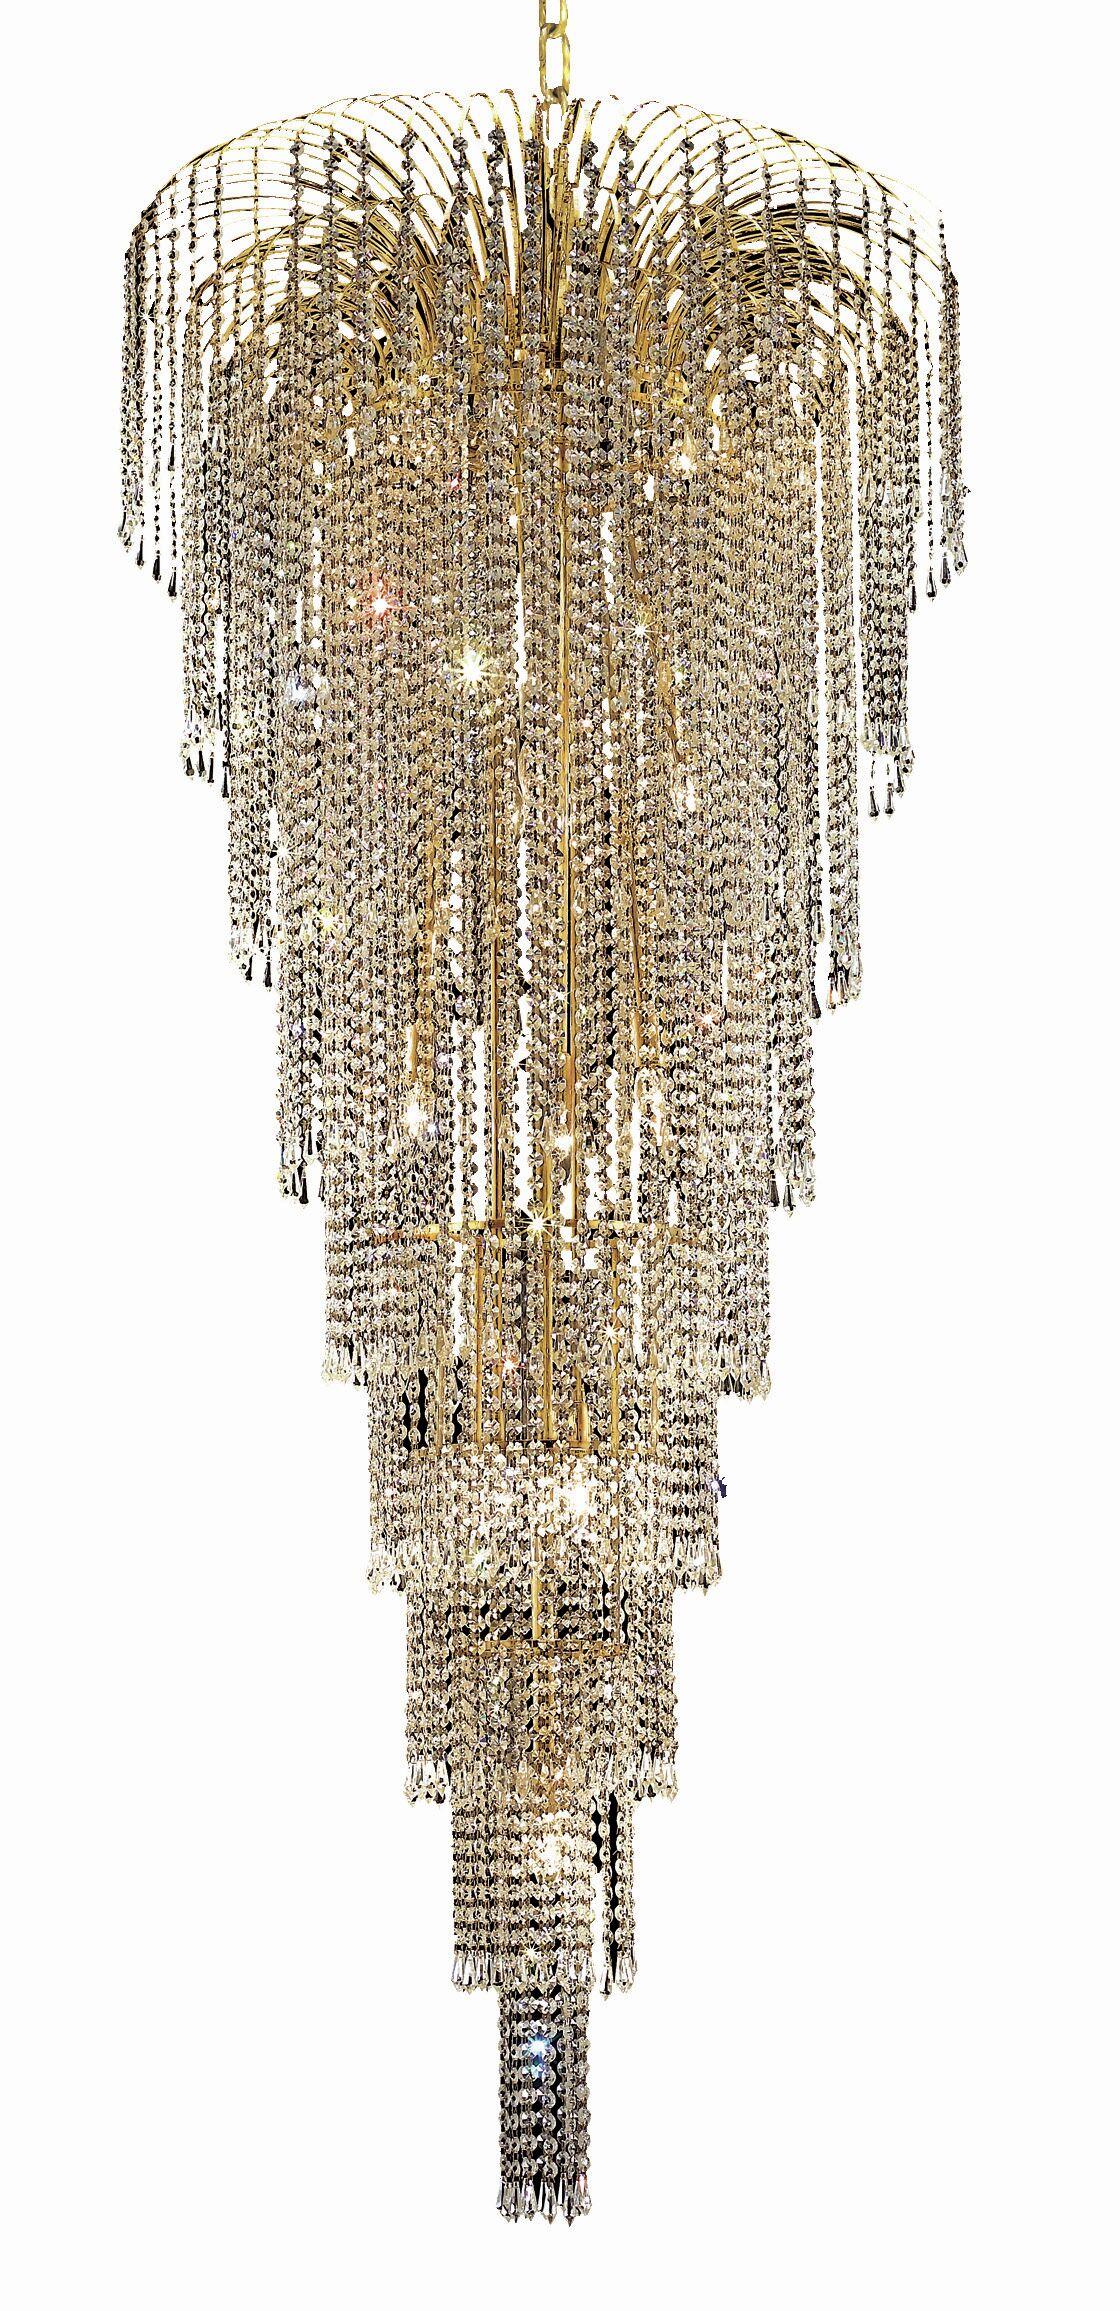 Westrem 15-Light Crystal Chandelier Finish: Gold, Crystal Grade: Swarovski Strass